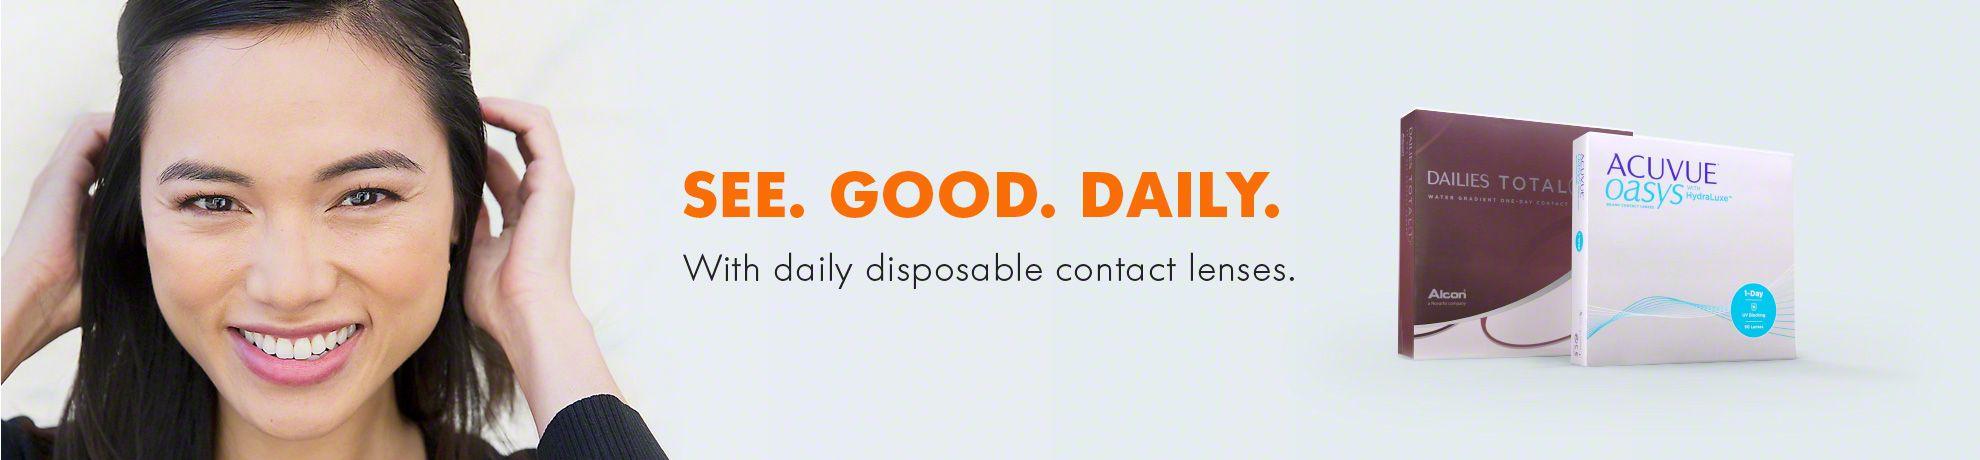 see good daily